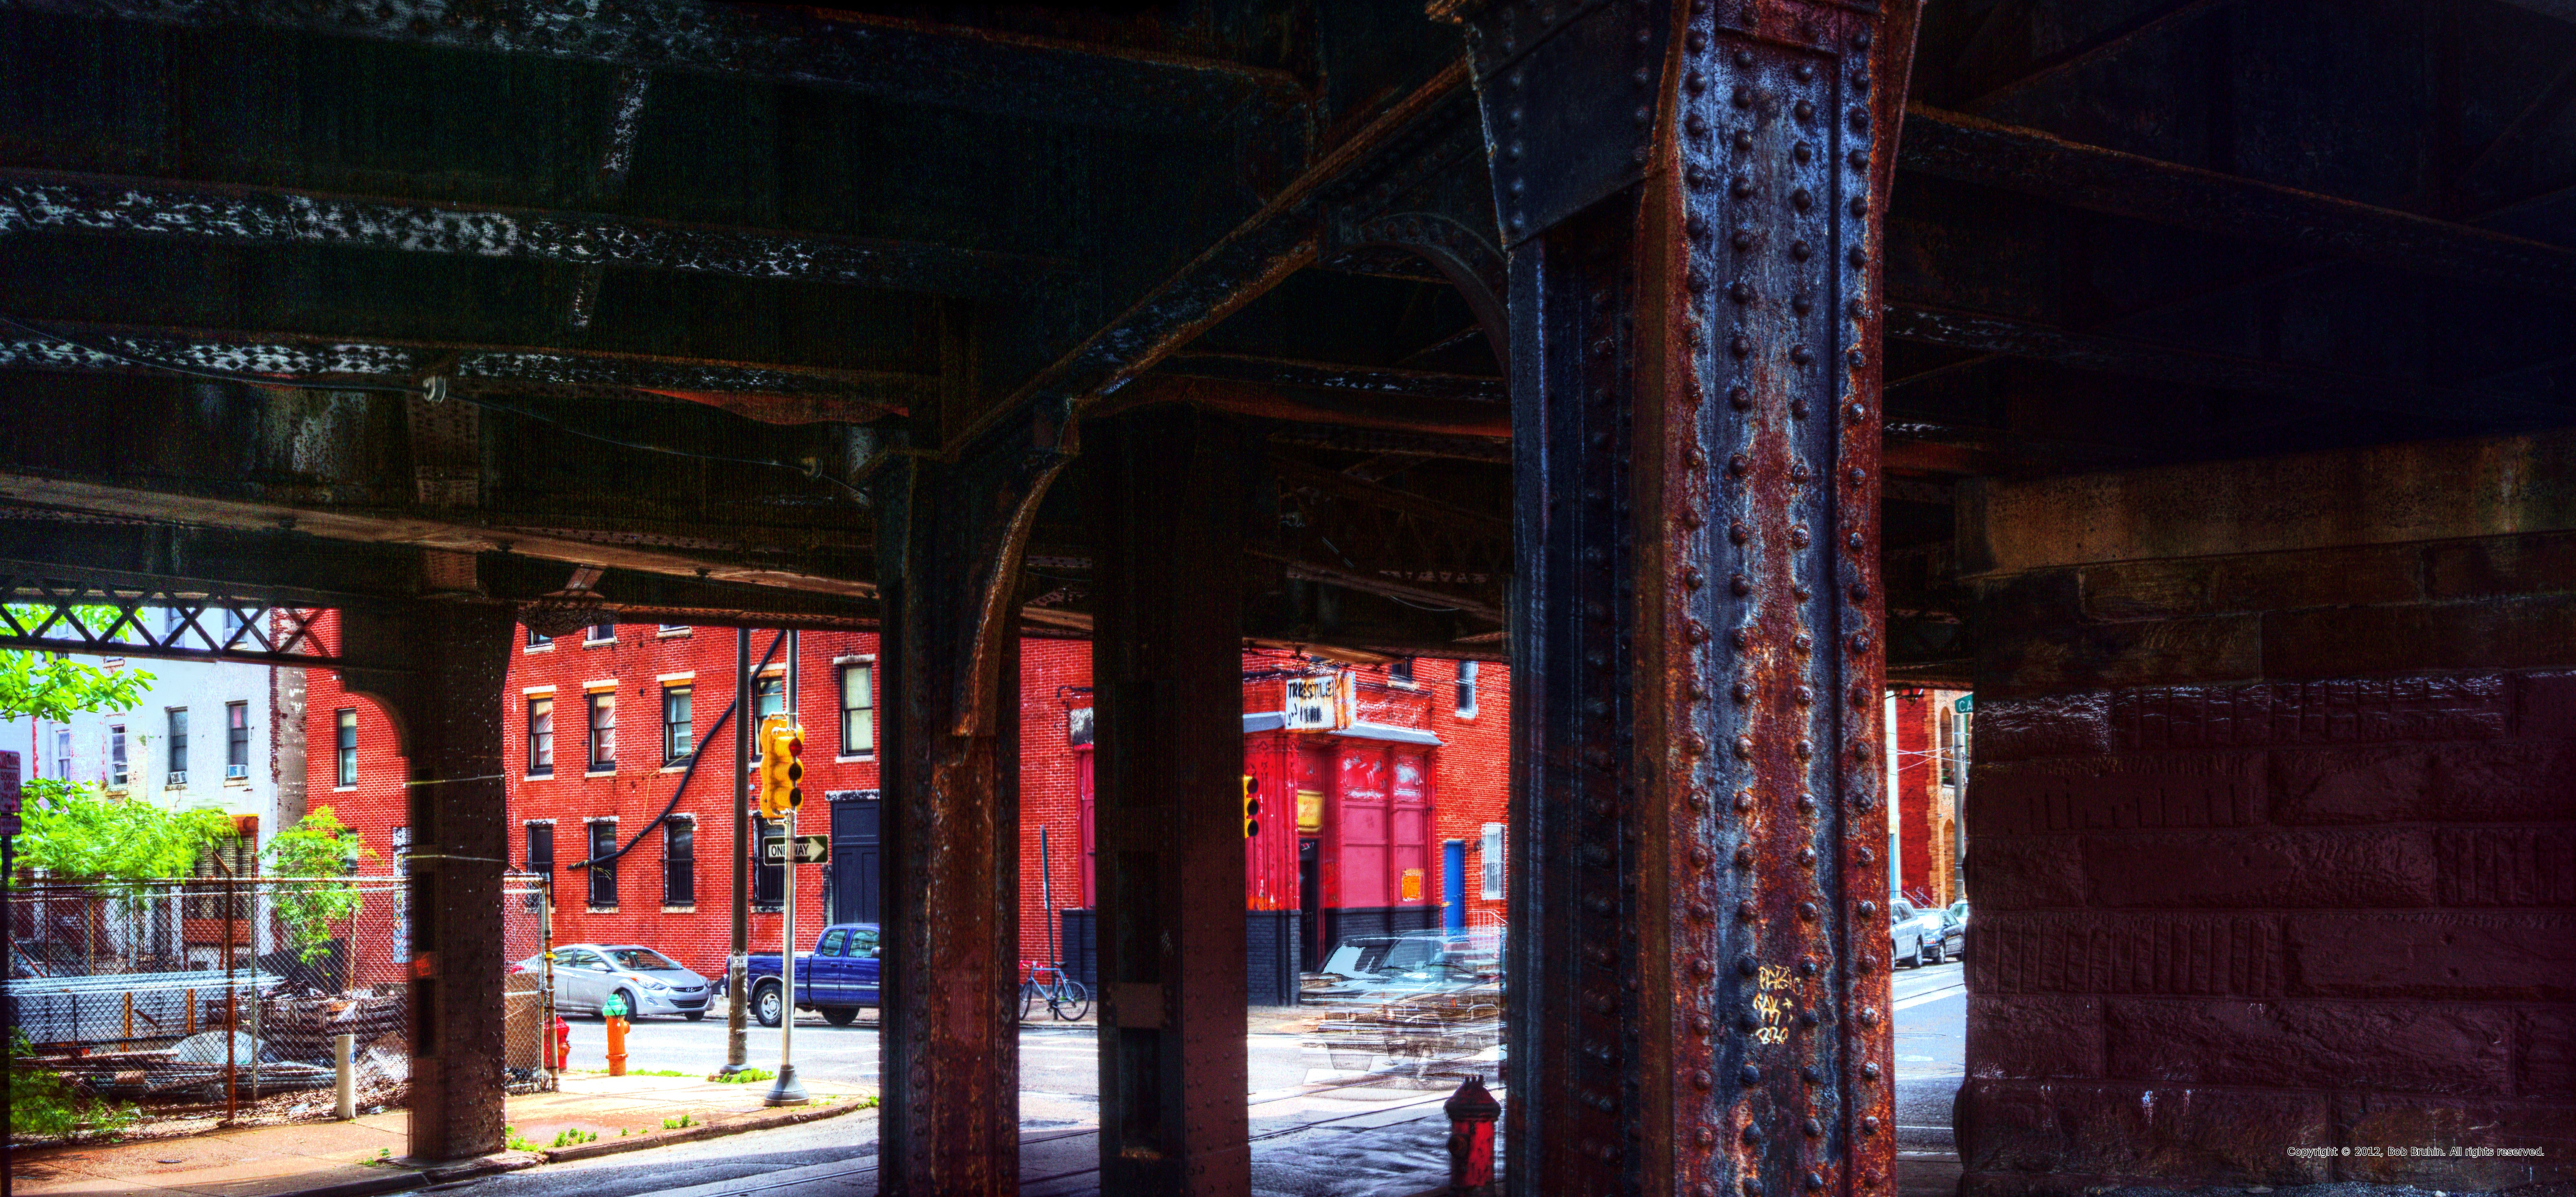 Panorama 1630 hdr pregamma 1 mantiuk contrast  by bruhinb